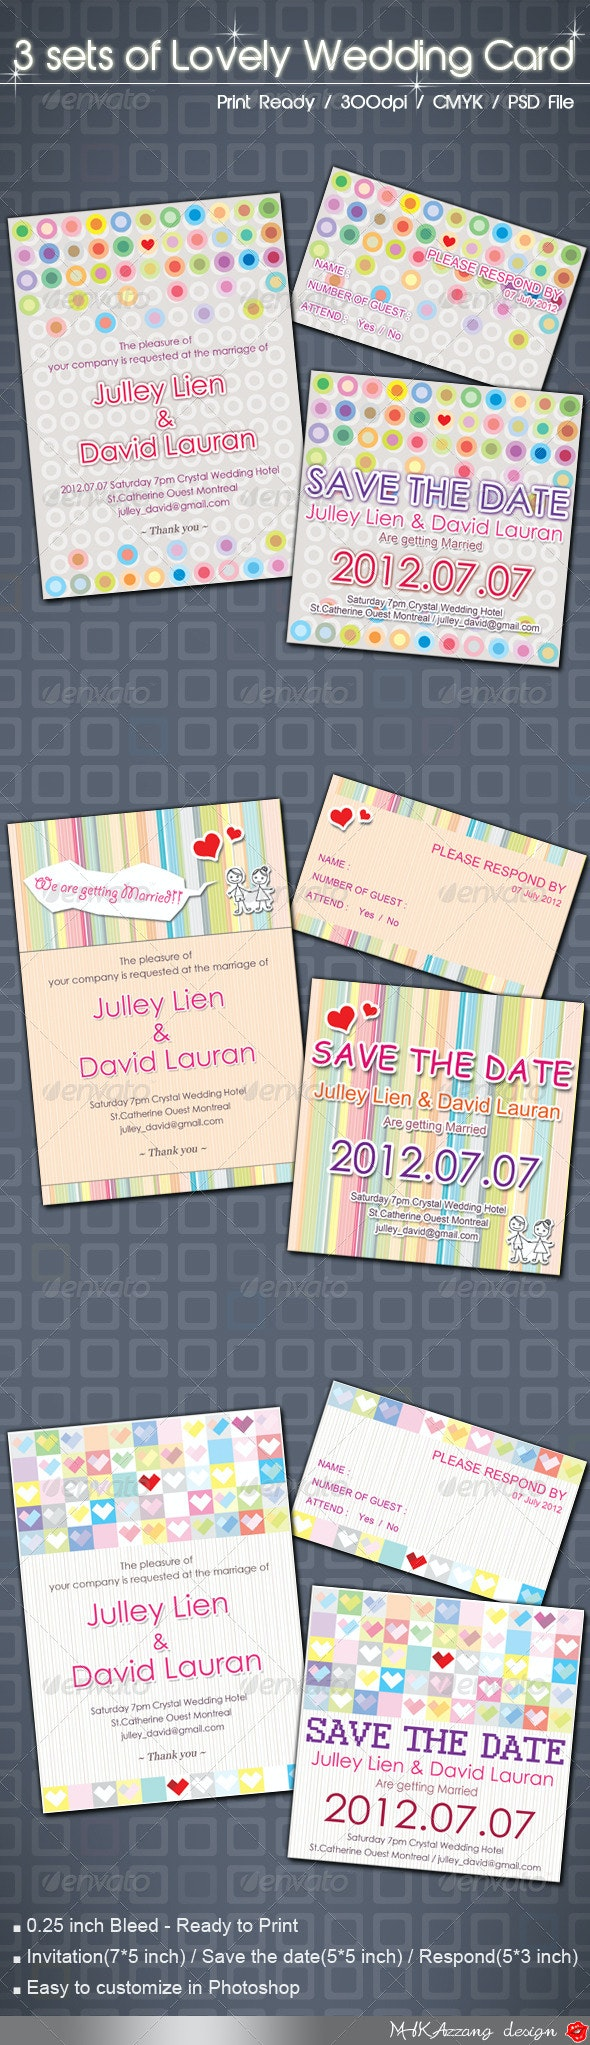 3 Items Lovely Wedding Card - Weddings Cards & Invites